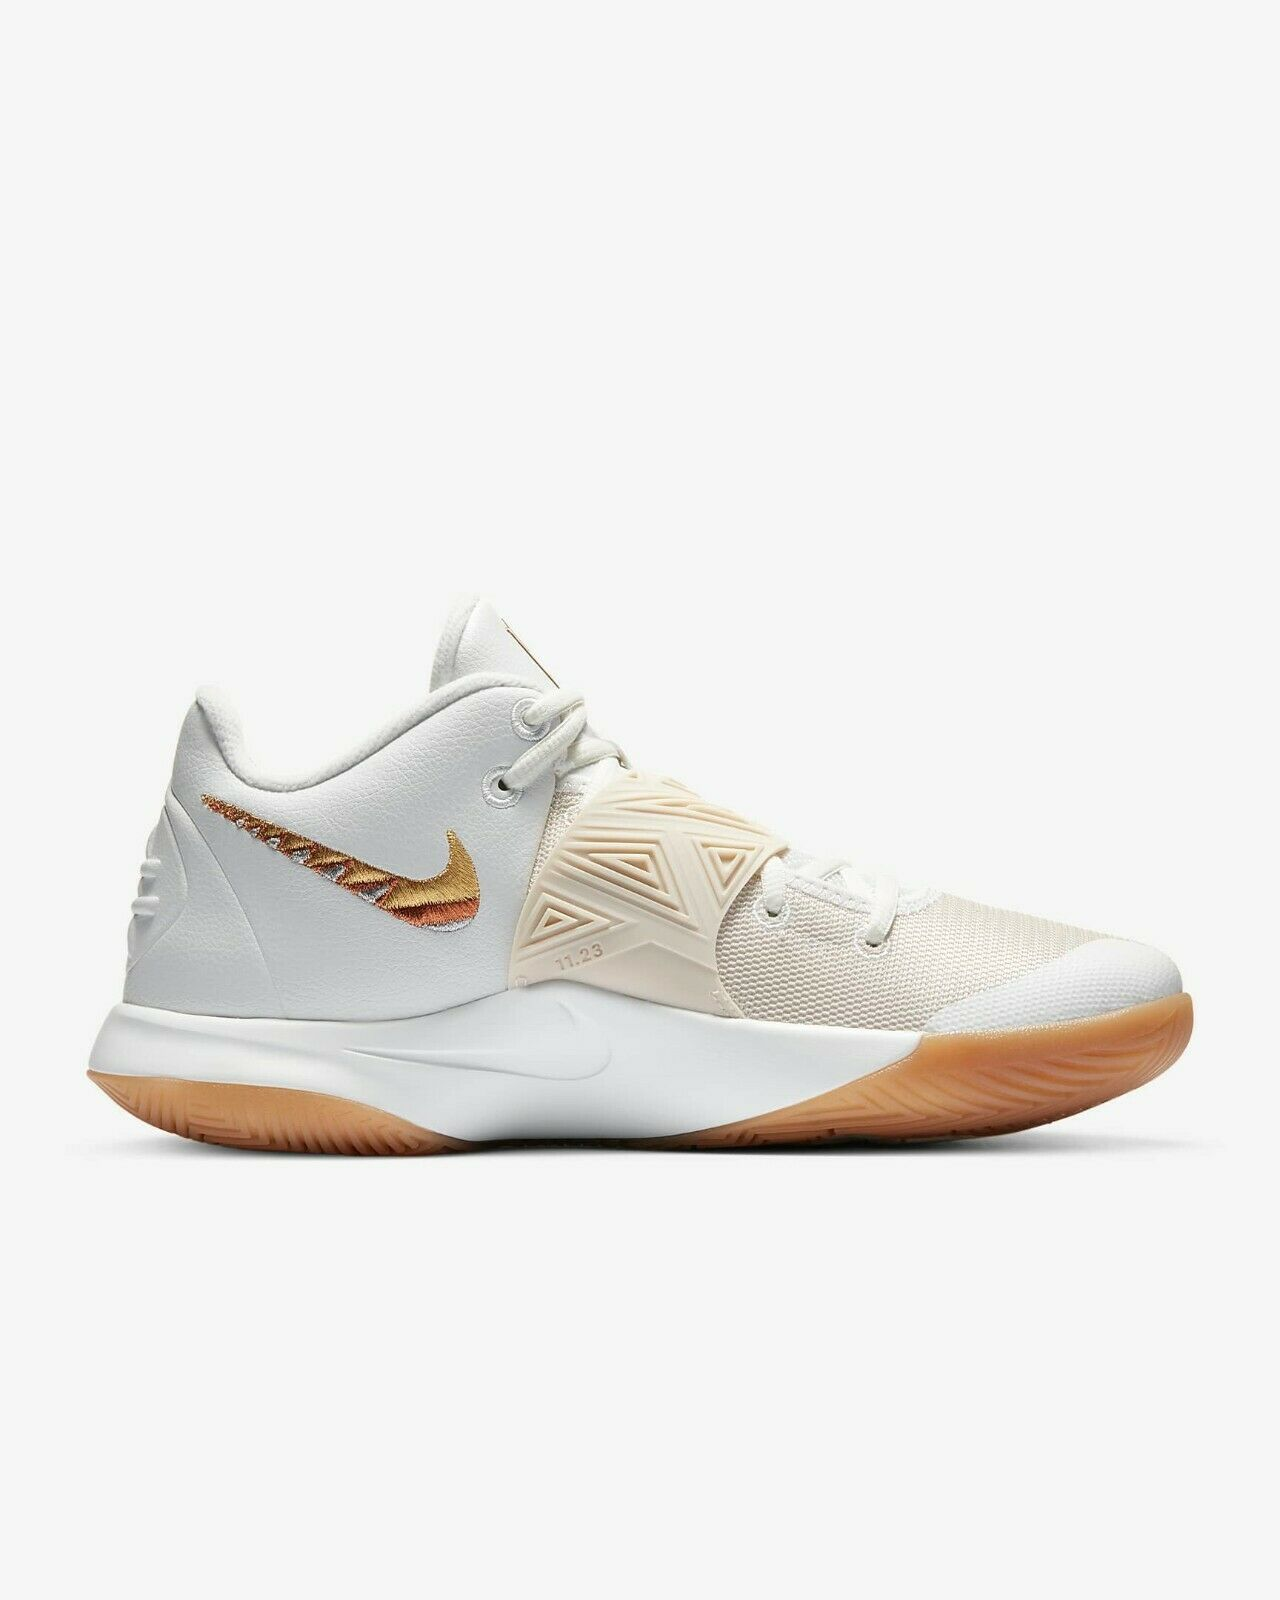 Nike Kyrie 3 EP 852396-902 Men